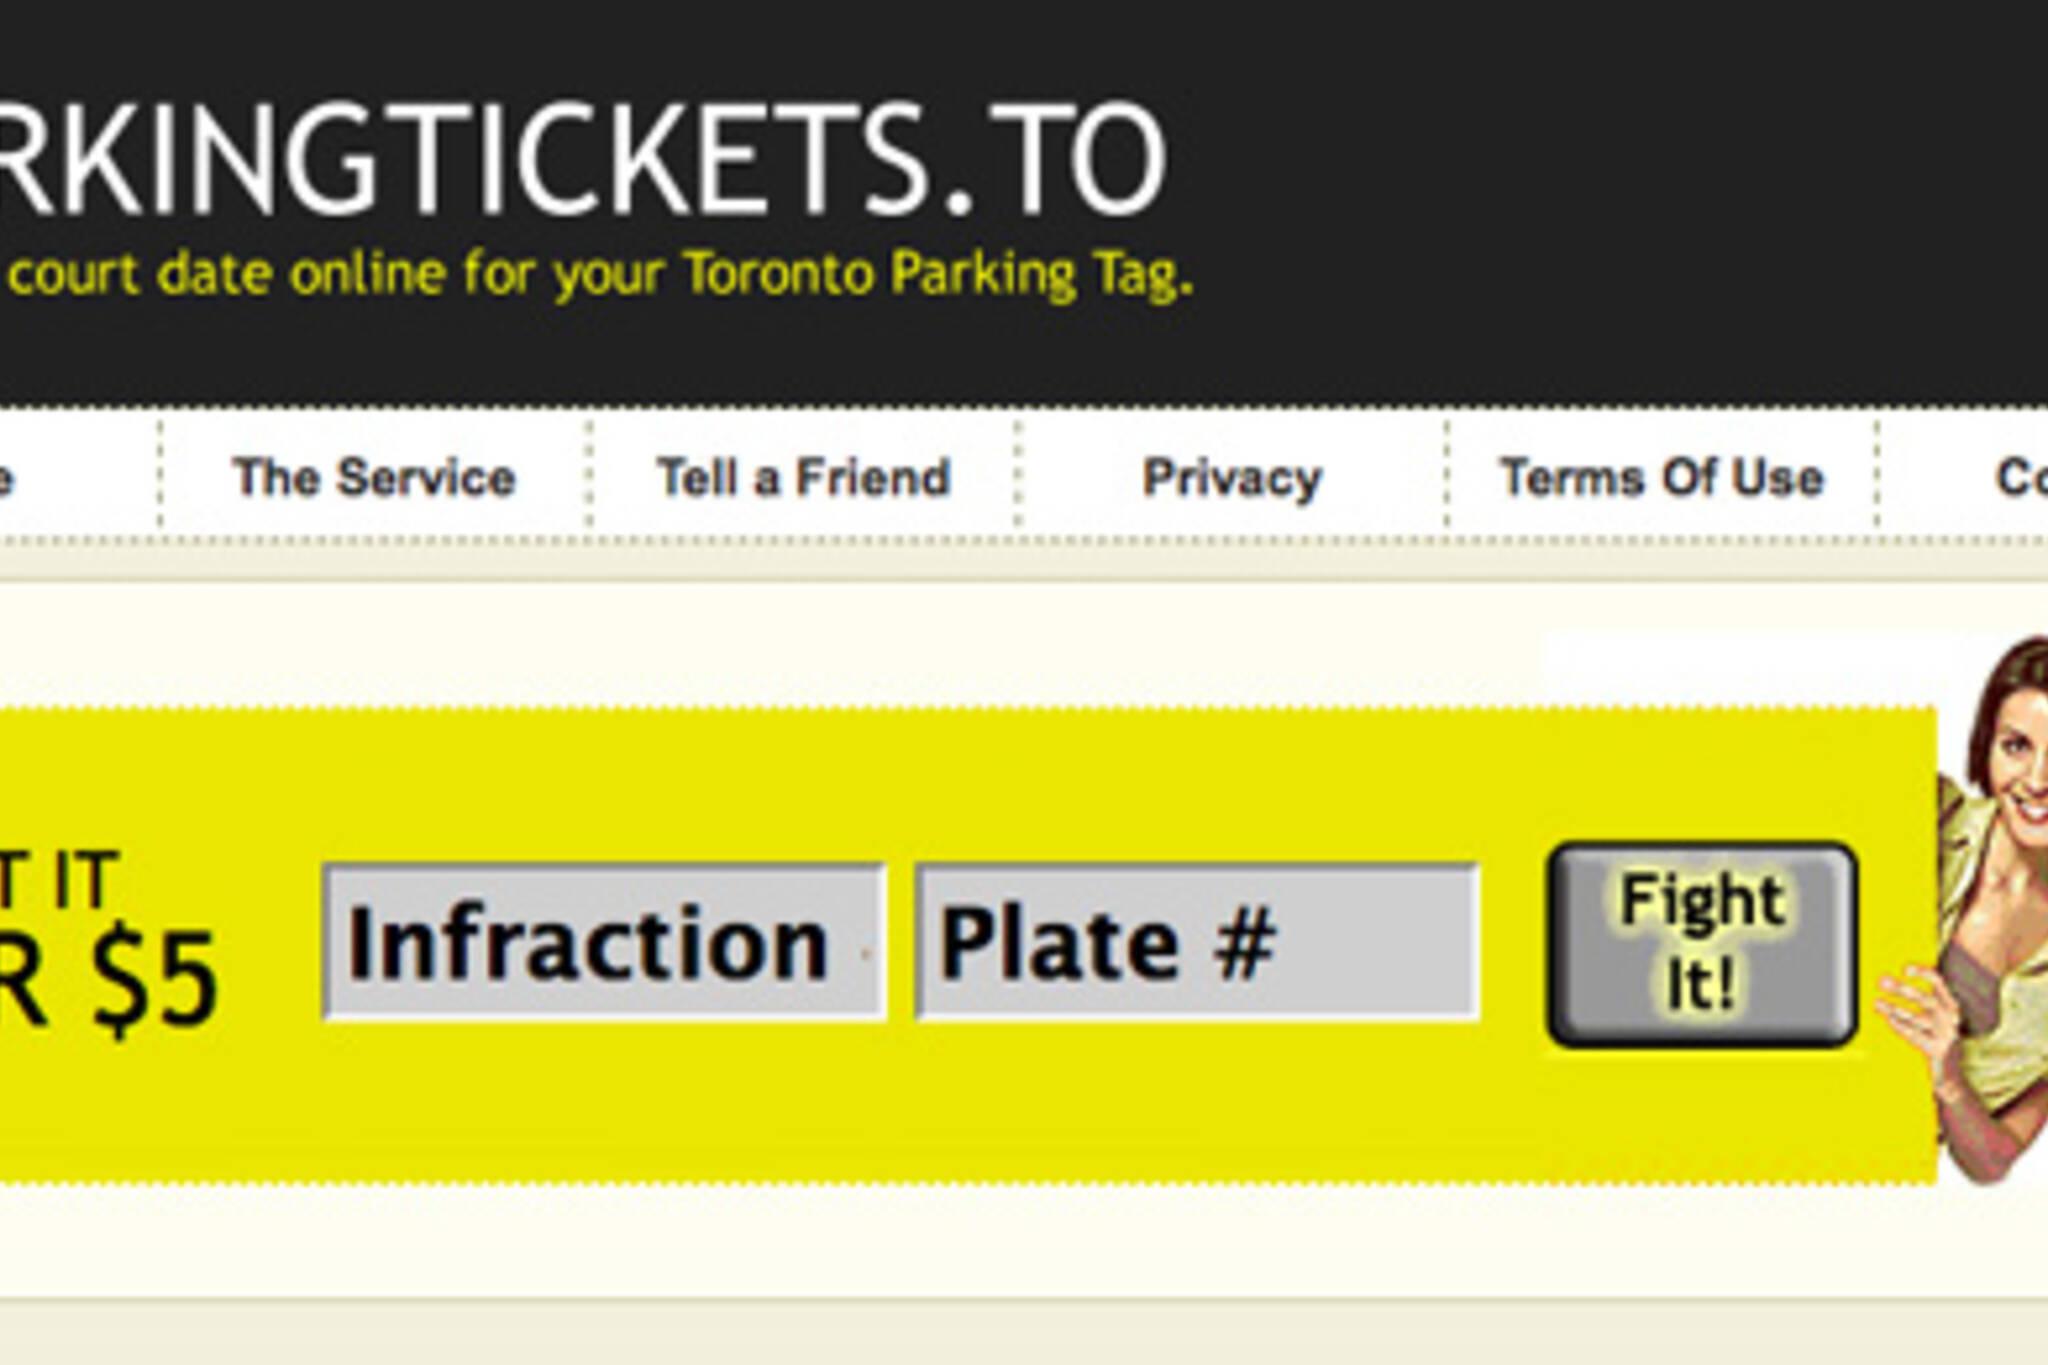 Toronto Parking Tickets